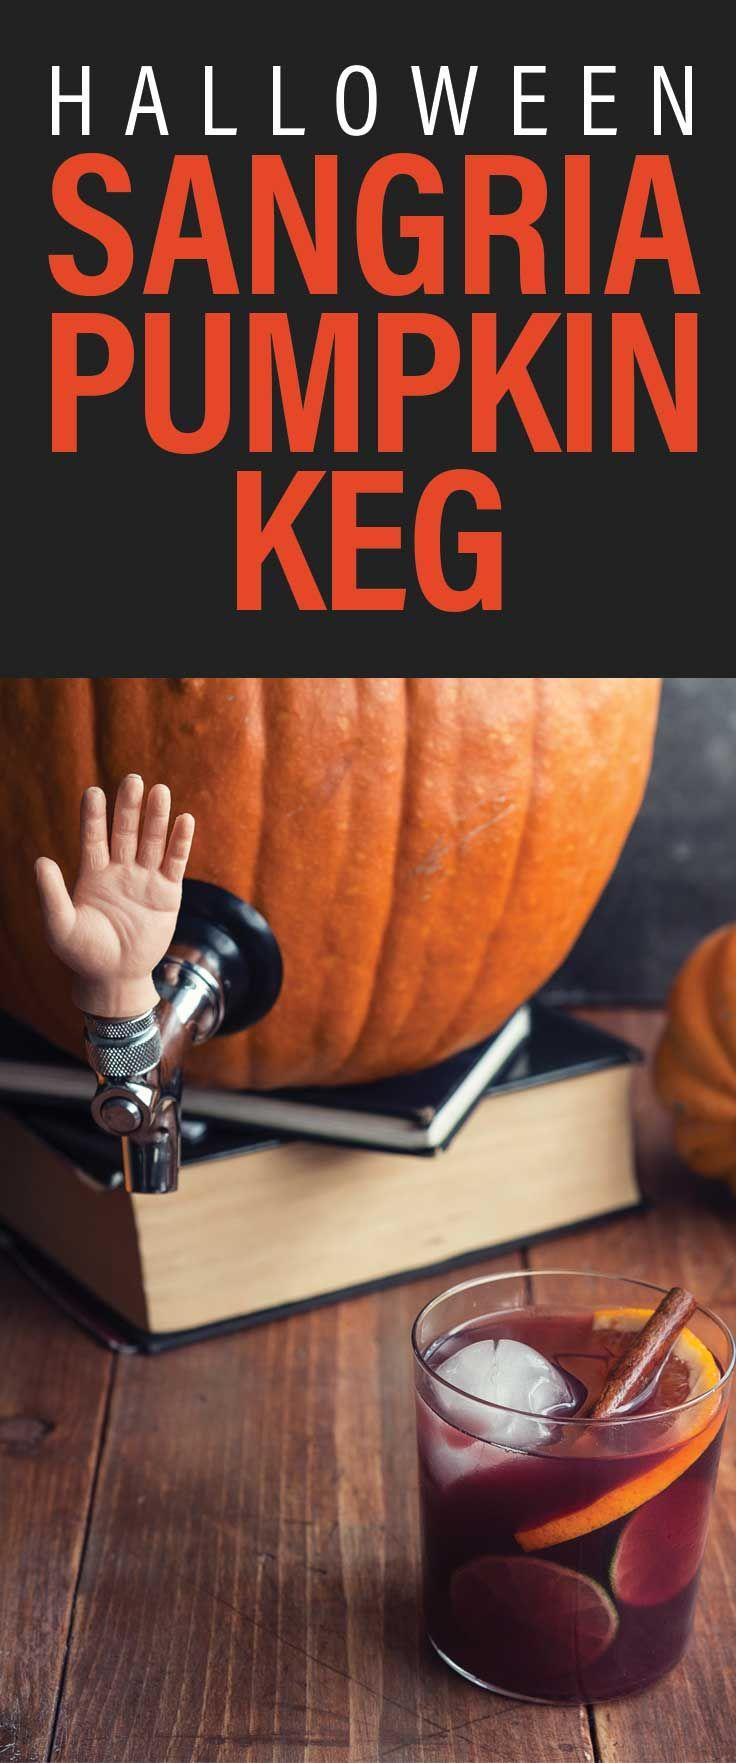 105 best Halloween images on Pinterest | Halloween recipe ...